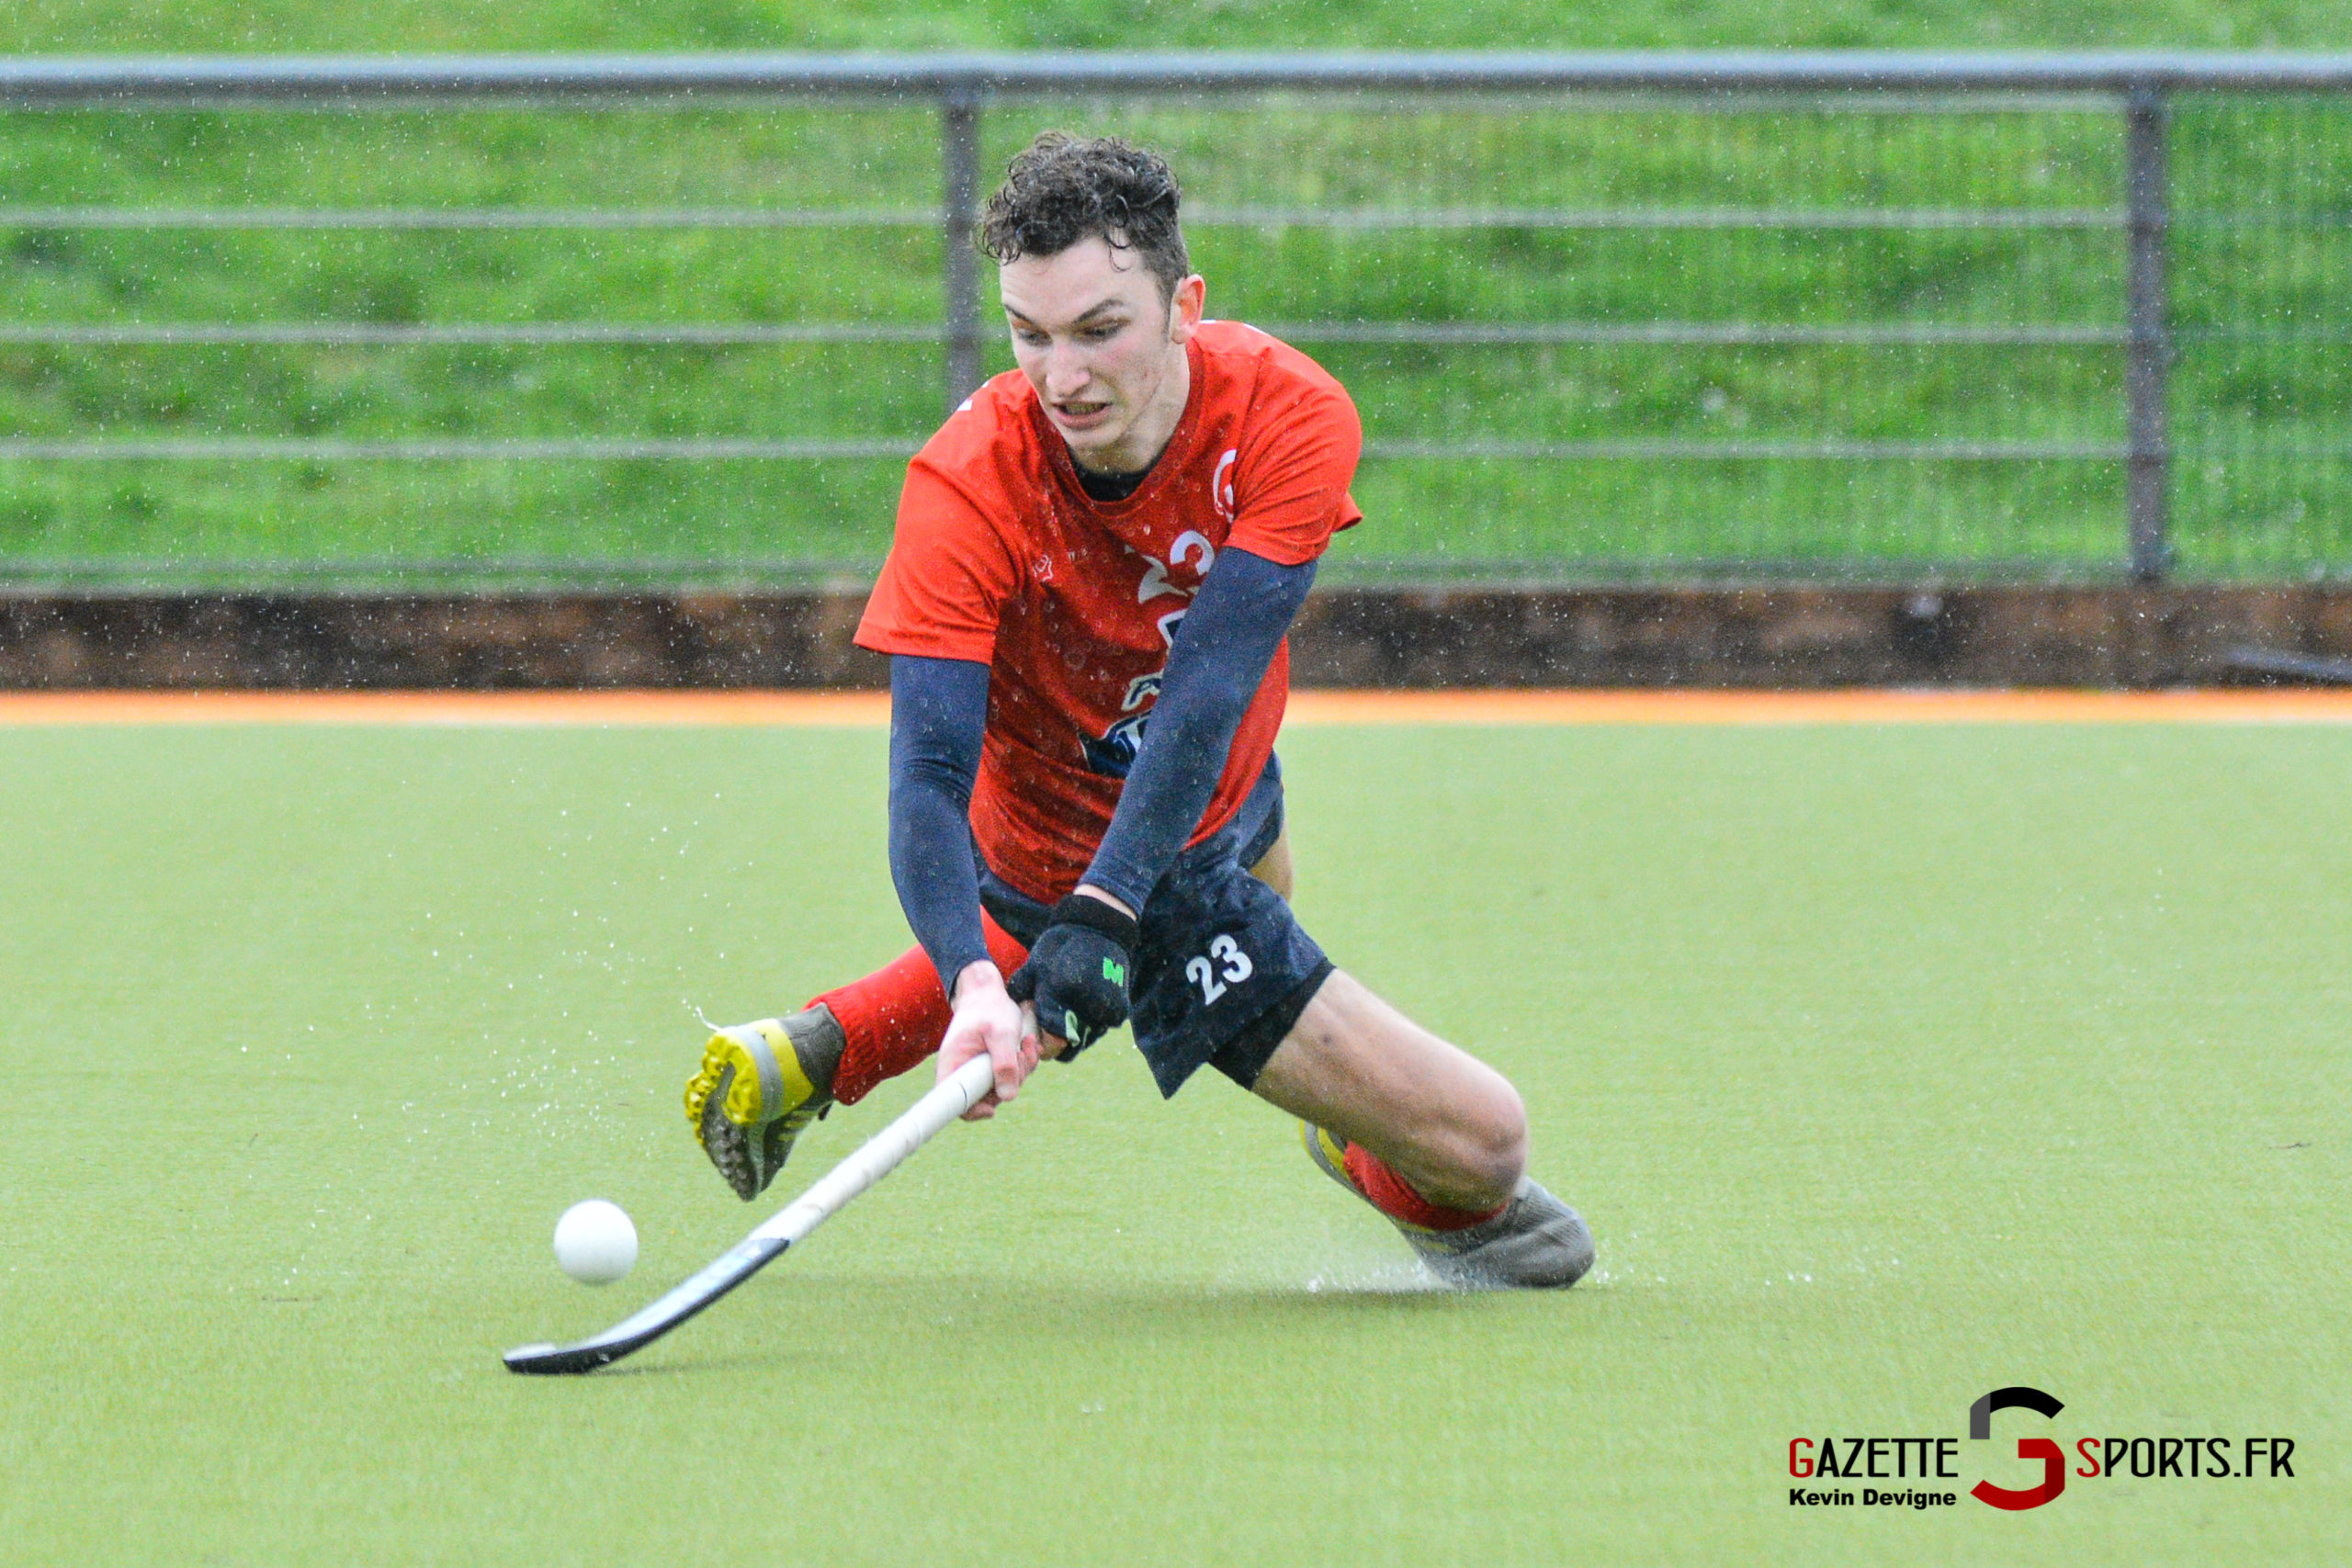 Hockey Sur Gazon Amiens Vs Paris Kevin Devigne Gazettesports 14